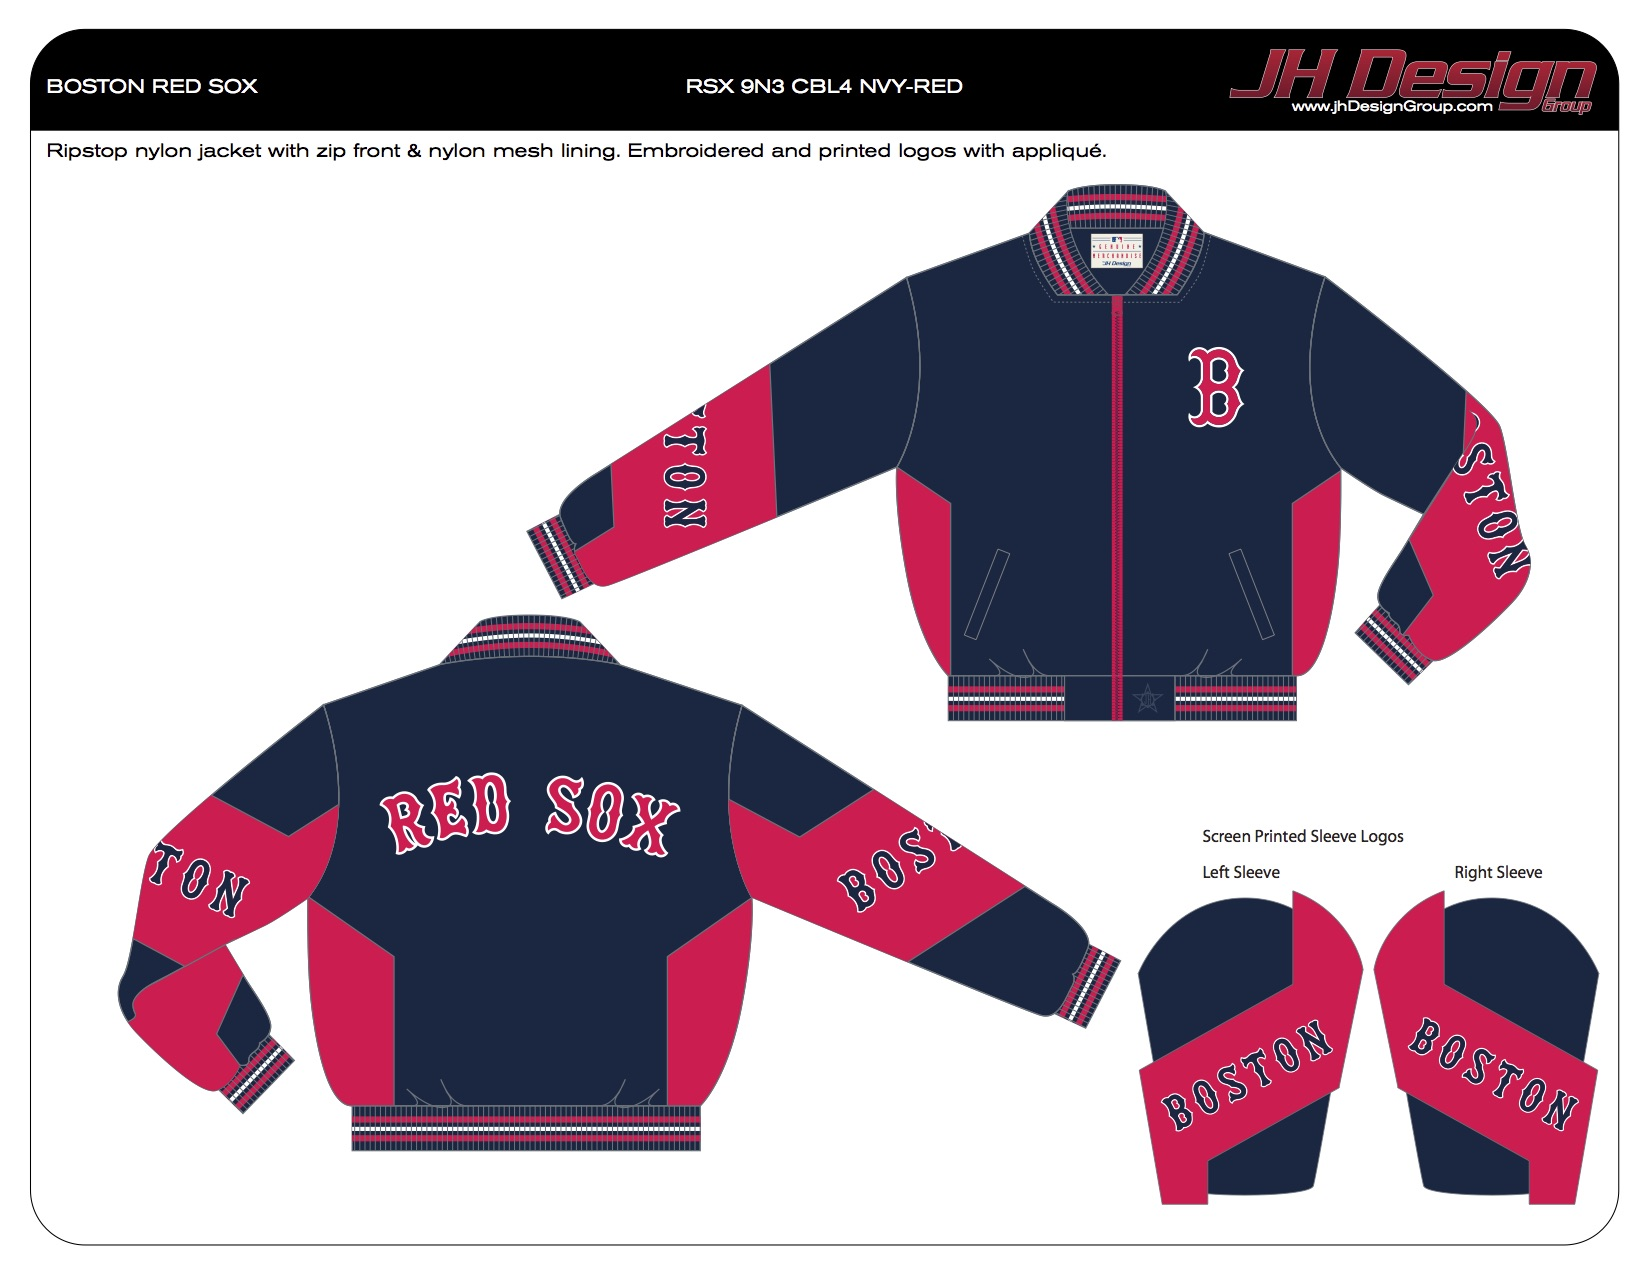 RSX 9N3 CBL4 NVY-RED